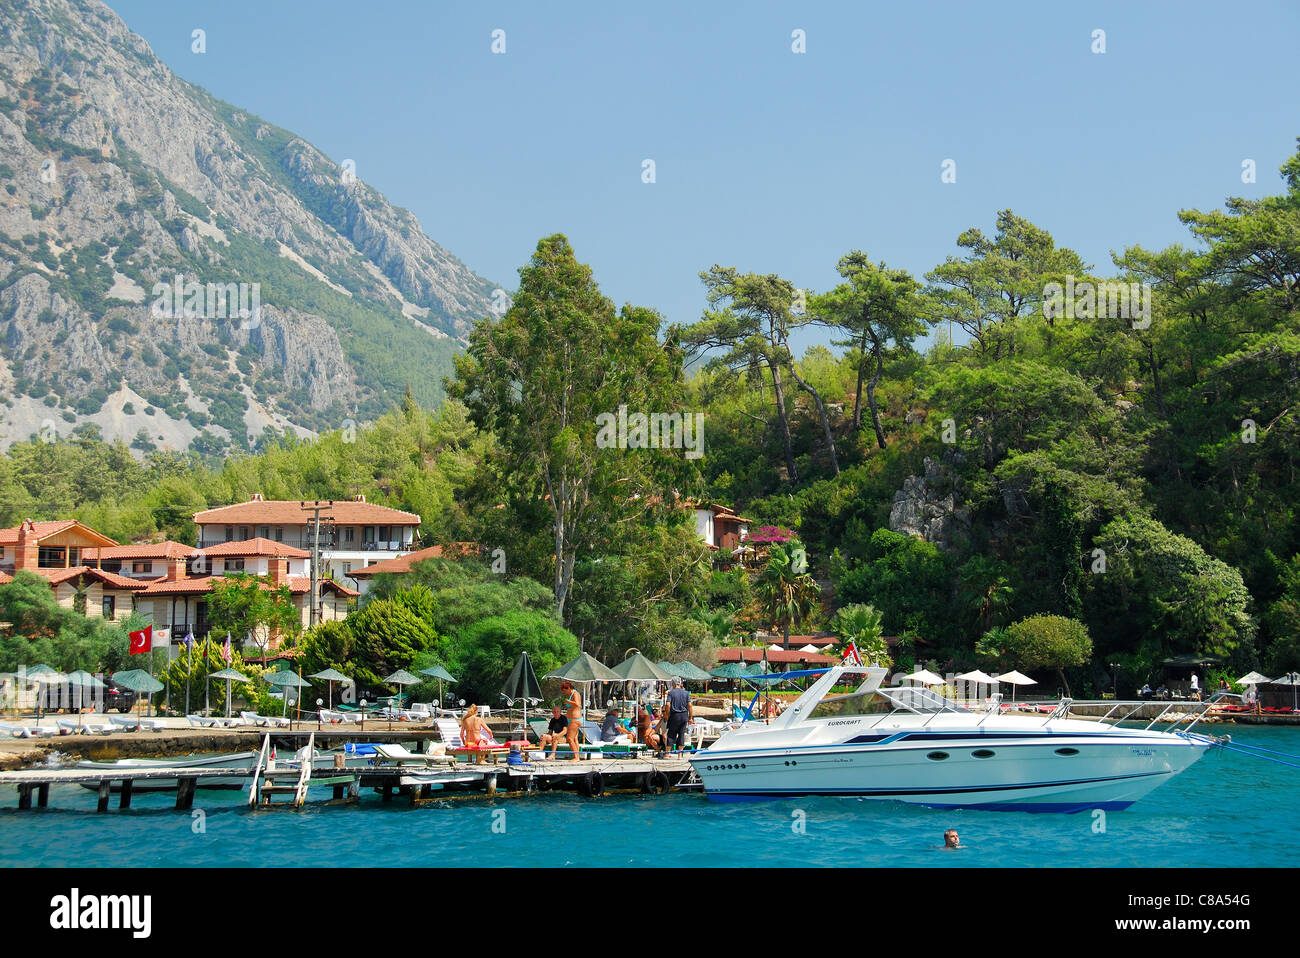 AKYAKA, TURKEY. A view of the hamlet of Iskele outside Akyaka on the Aegean coast. 2011. - Stock Image